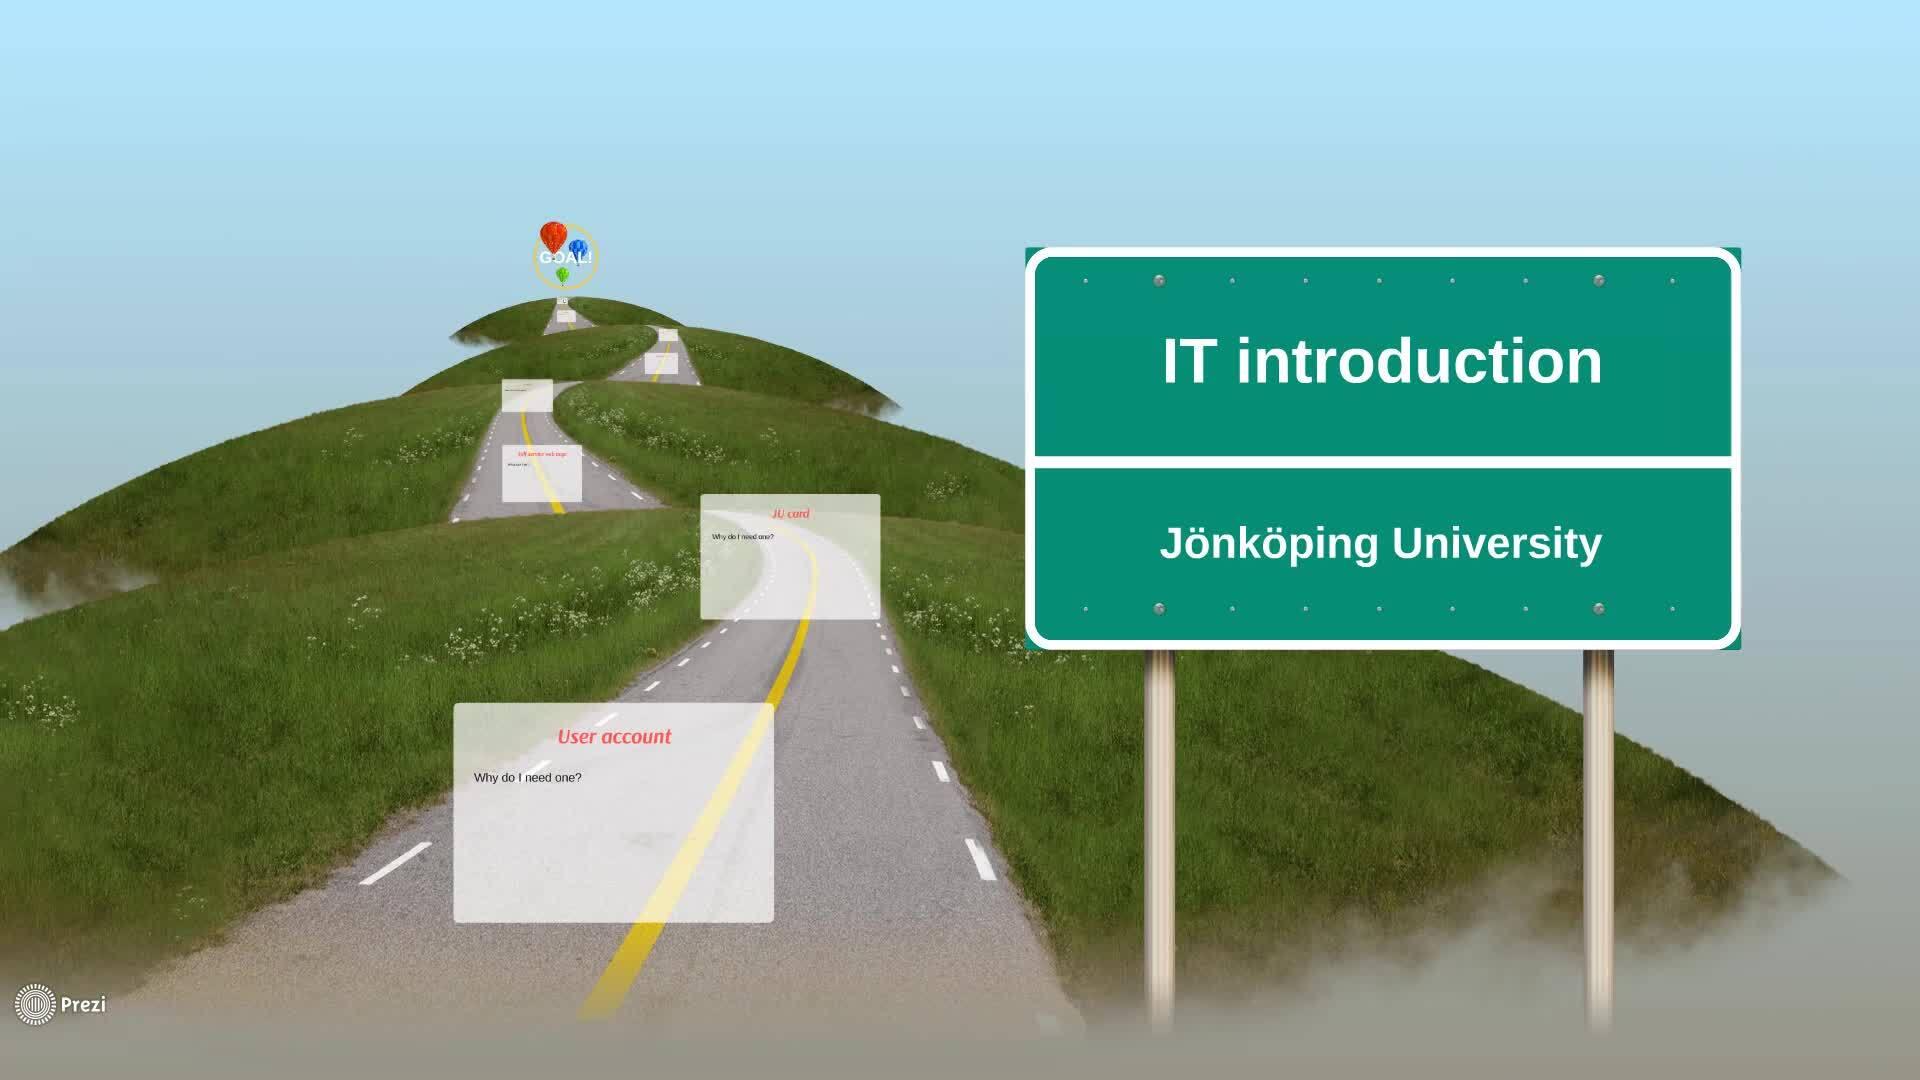 IT introduction - 2019 - JU play - Jönköping University